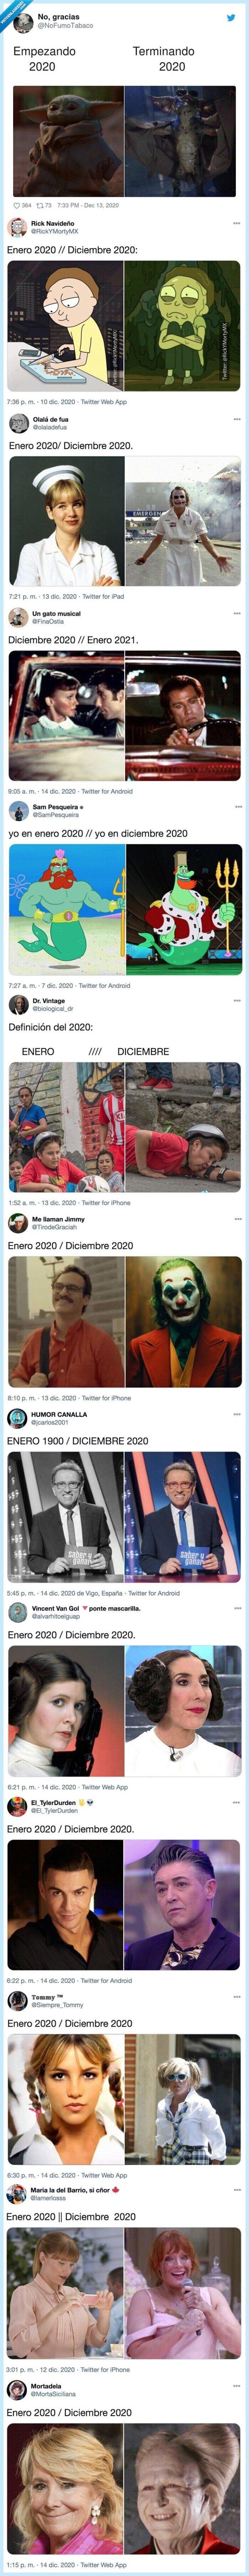 2020,diciembre,empezando,enero,terminando